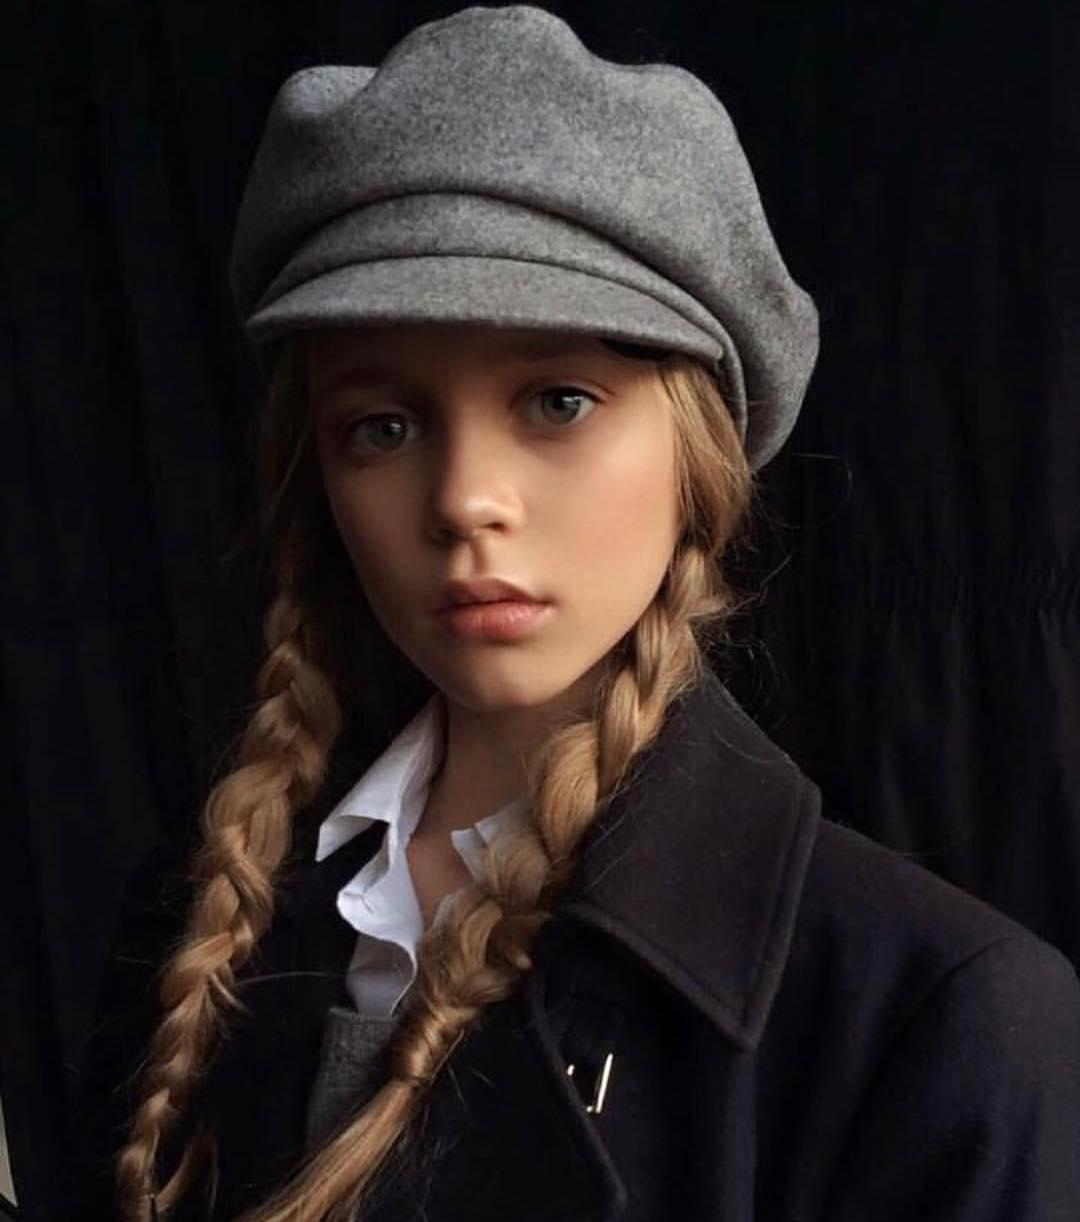 Пятиклассница из Сибири покоряет империю моды